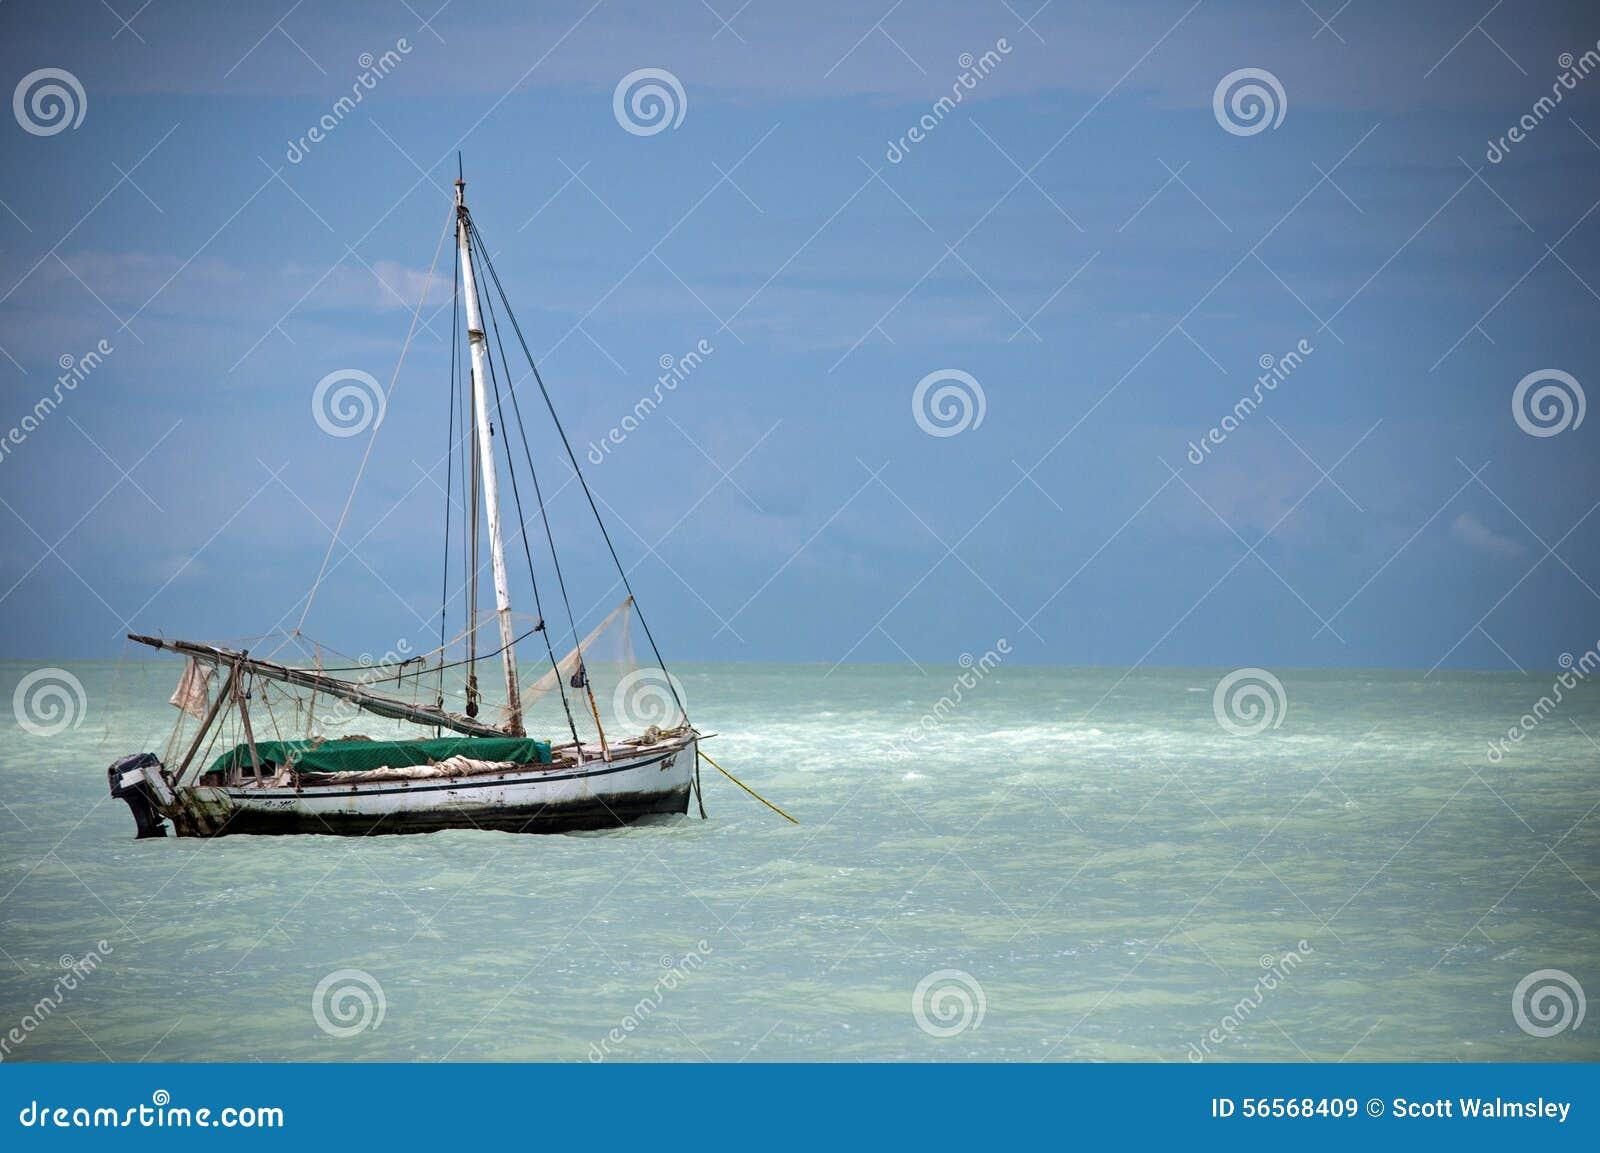 Download Sailboat που δένεται στα λασπώδη νερά των Καραϊβικών Θαλασσών, Μπελίζ Στοκ Εικόνα - εικόνα από κεντρικός, αλιεία: 56568409